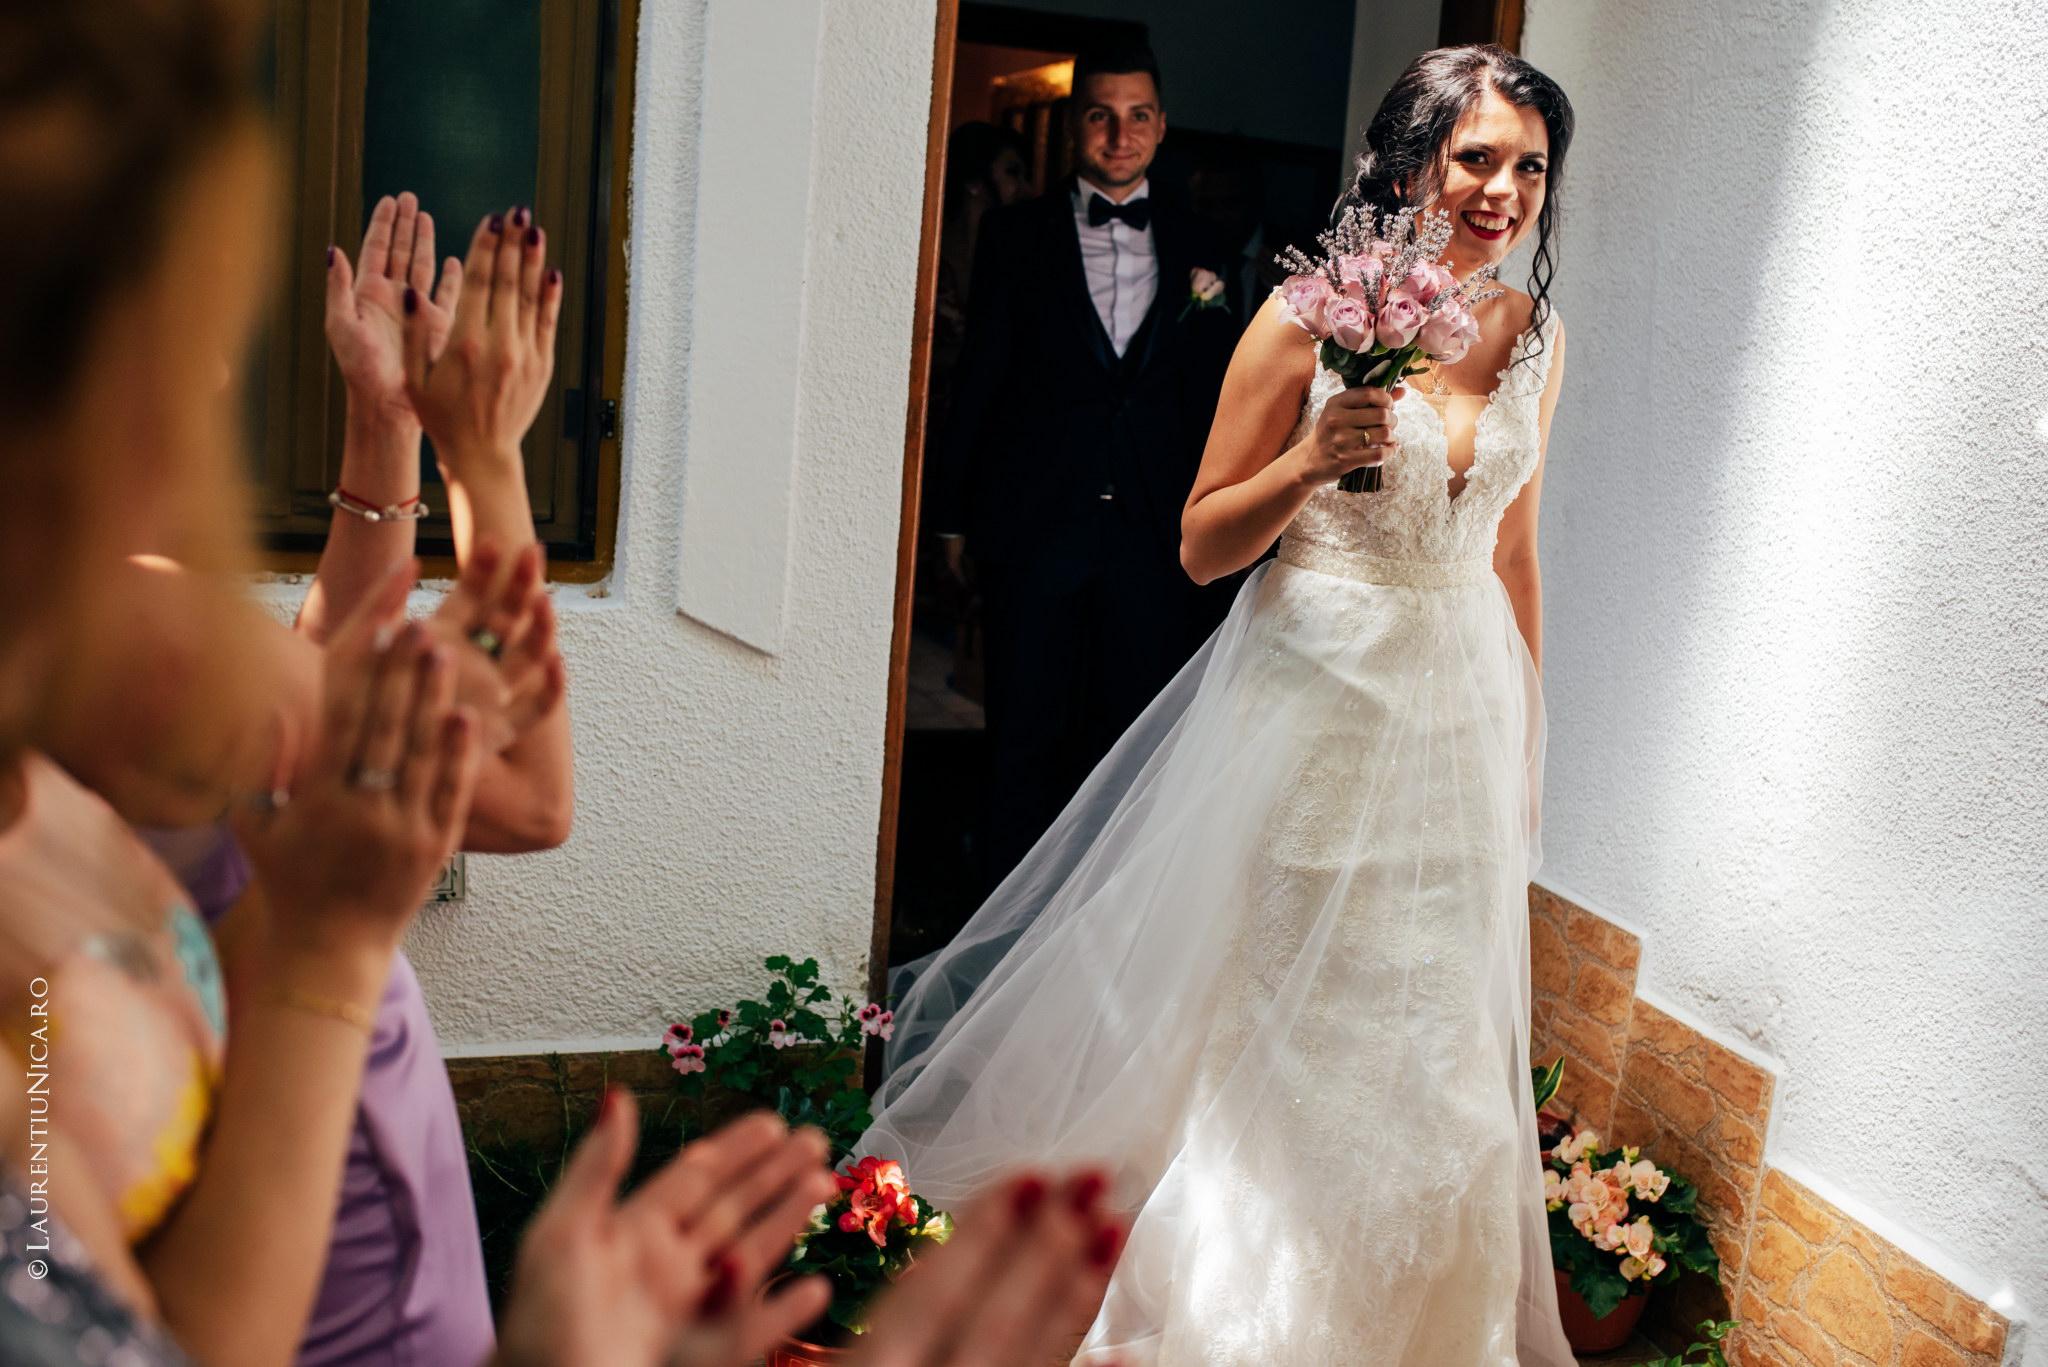 fotografii nunta craiova bia alex fotograf nunta laurentiu nica 47 - Bia & Alex | Fotografii nunta | Craiova